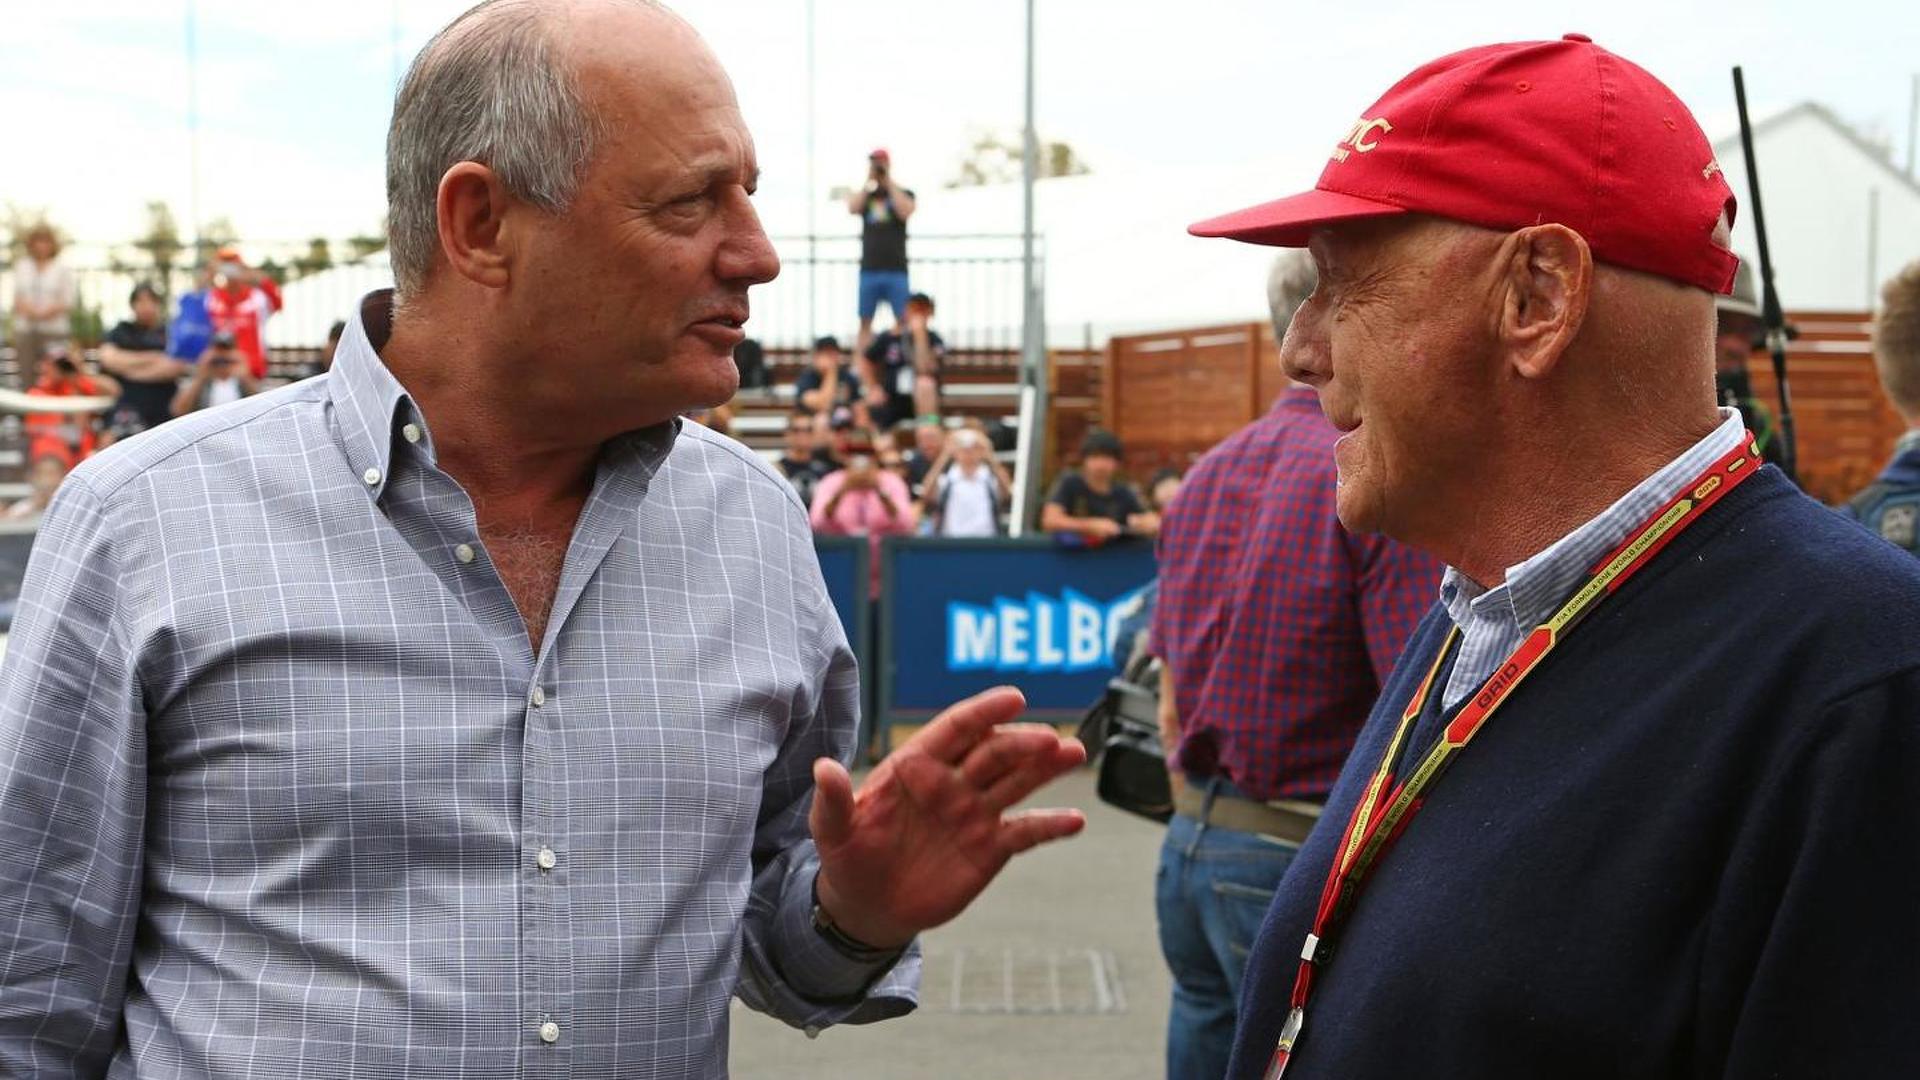 Sport is 'formula engine' now - Lauda